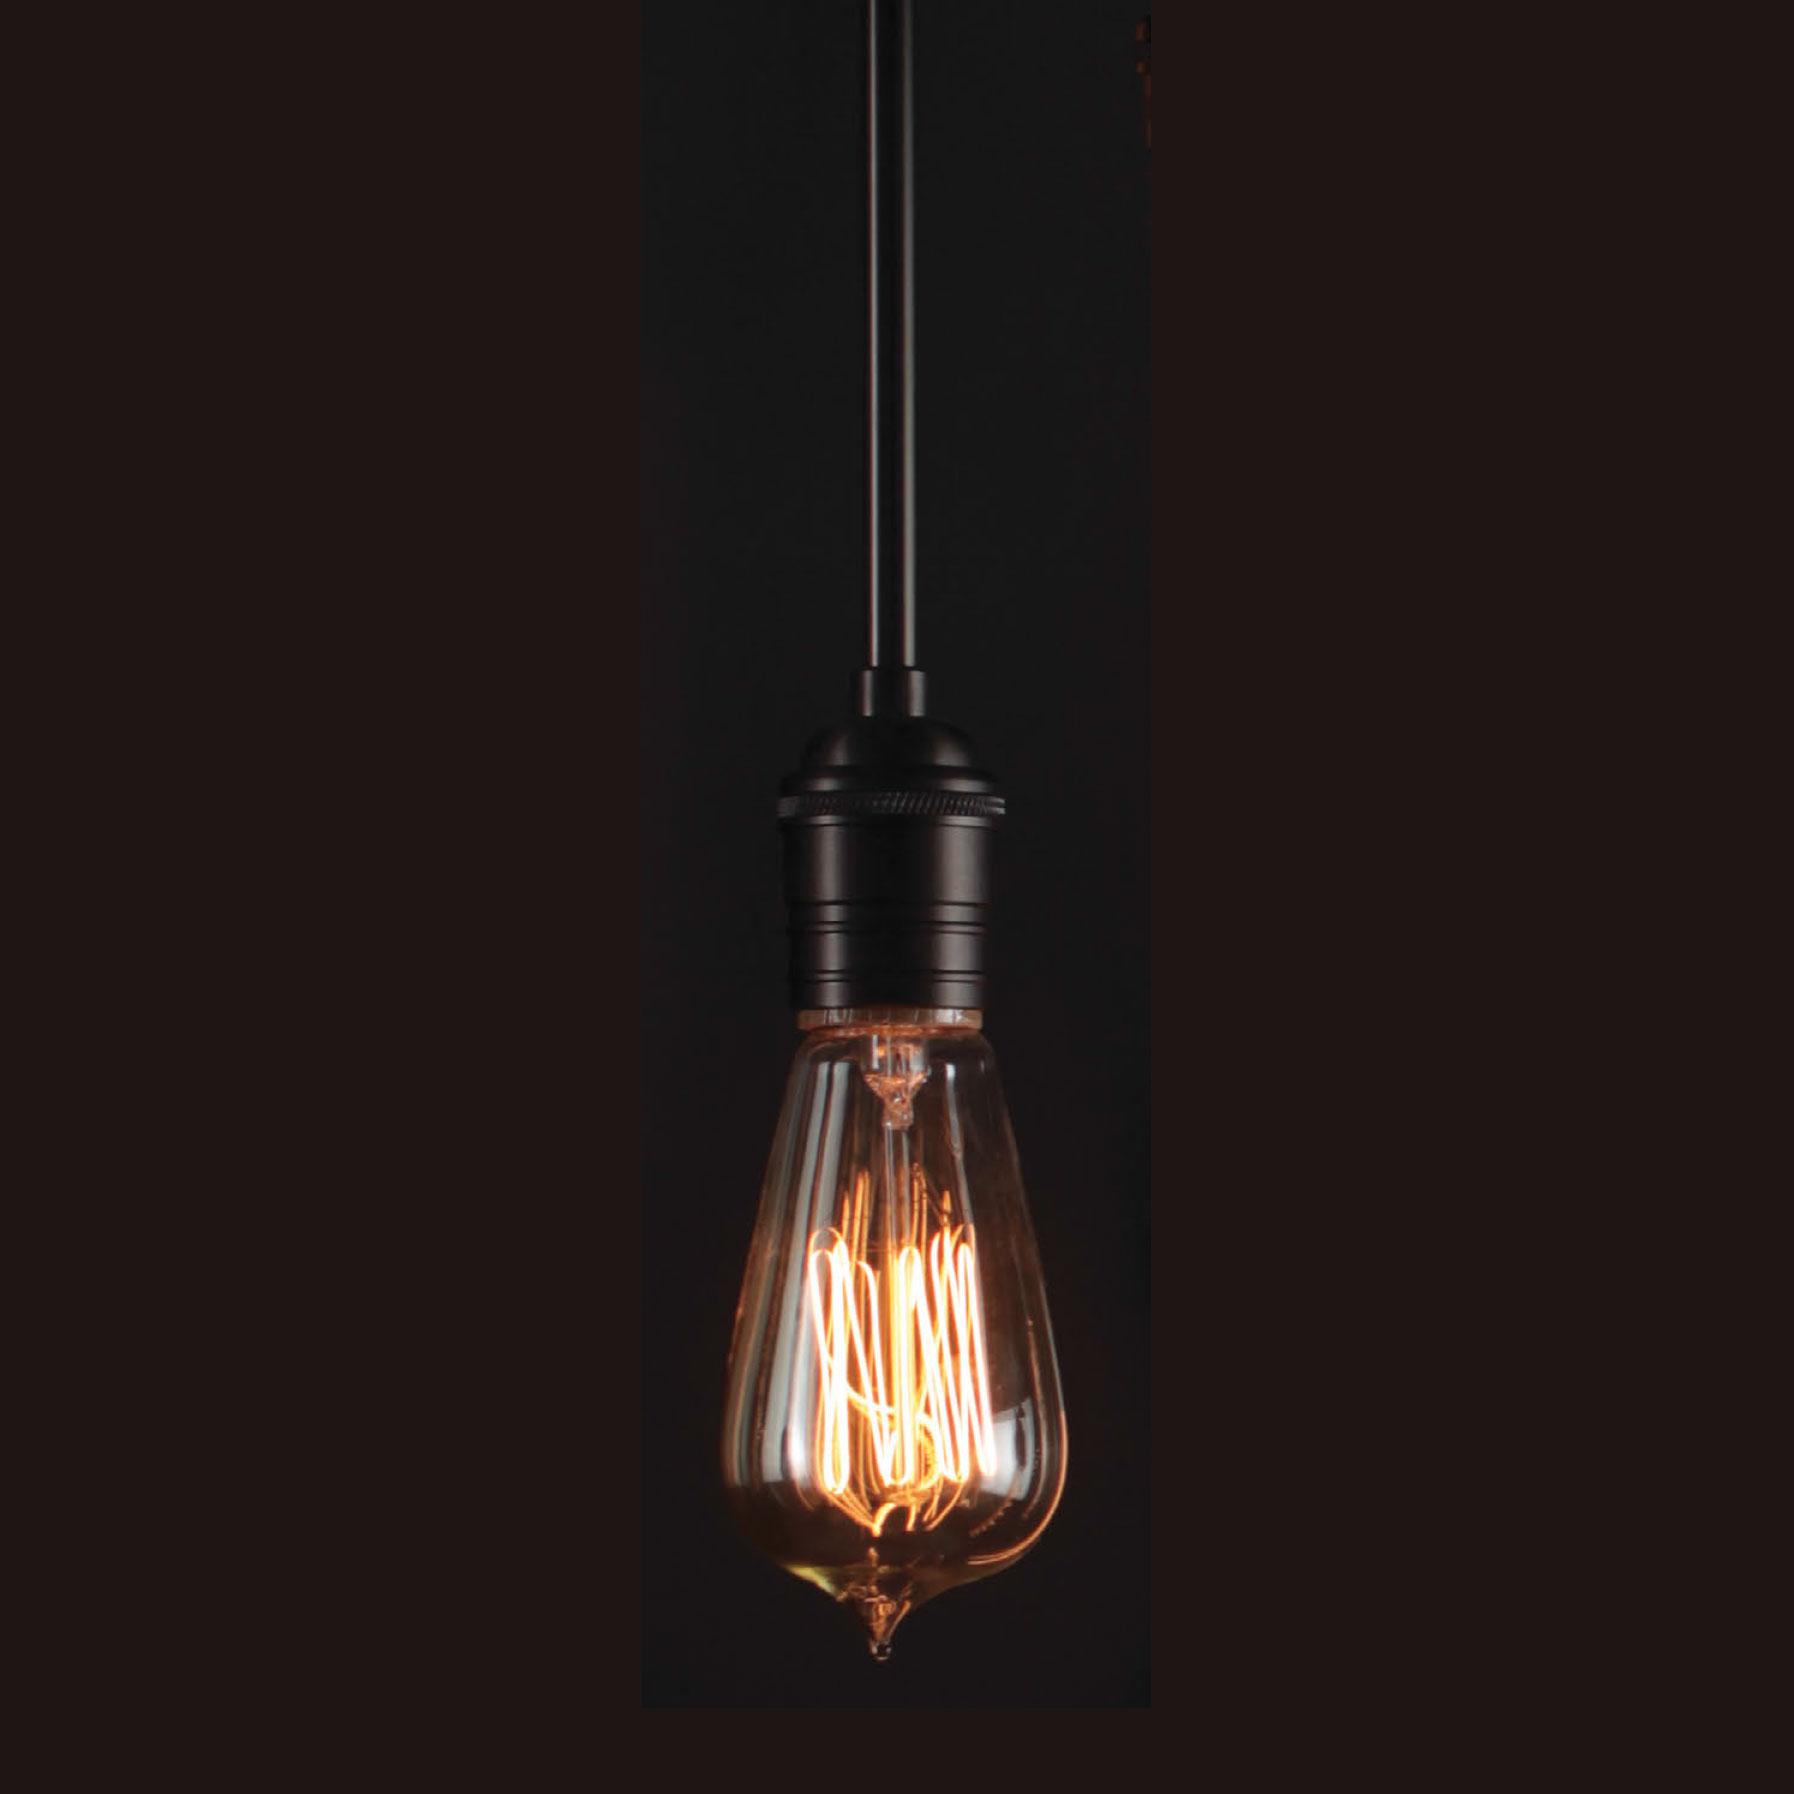 Retro Tube Edison Filament 60 Watt Light Bulb by Stone Lighting ...